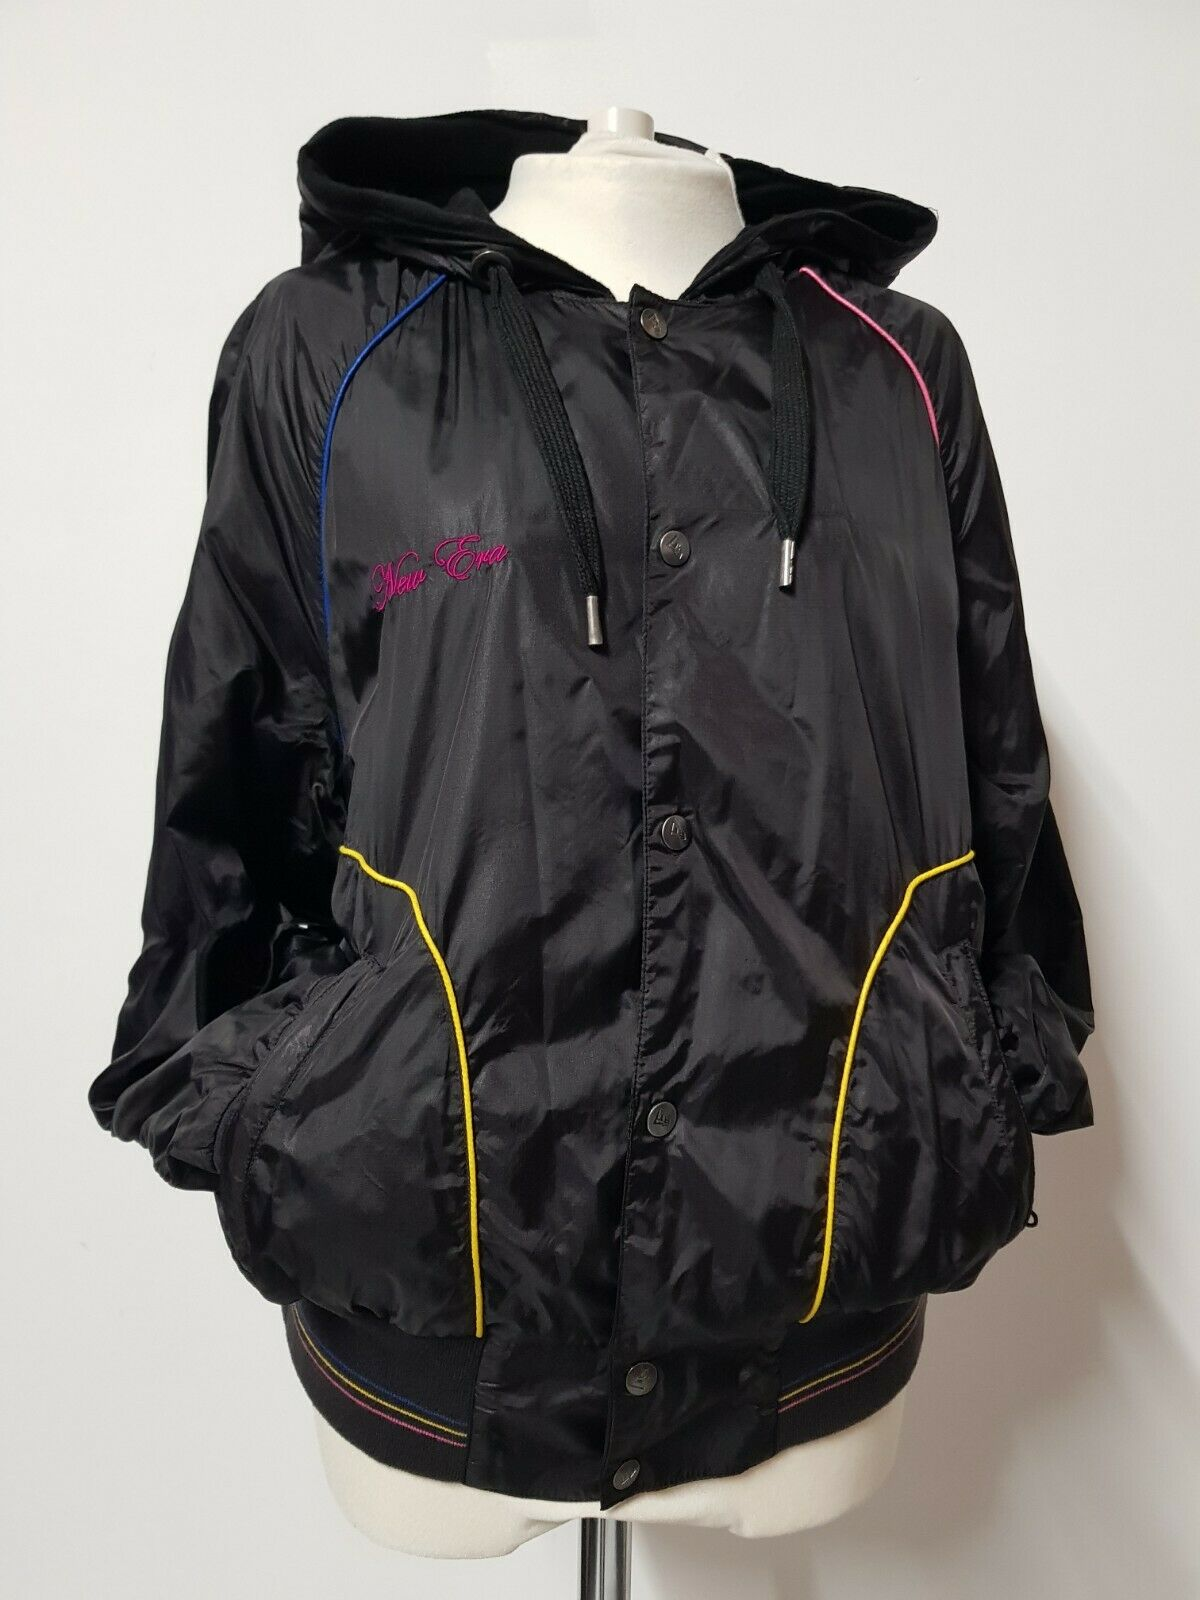 New Era Wet Look Full Zip Hooded Jacket Size M